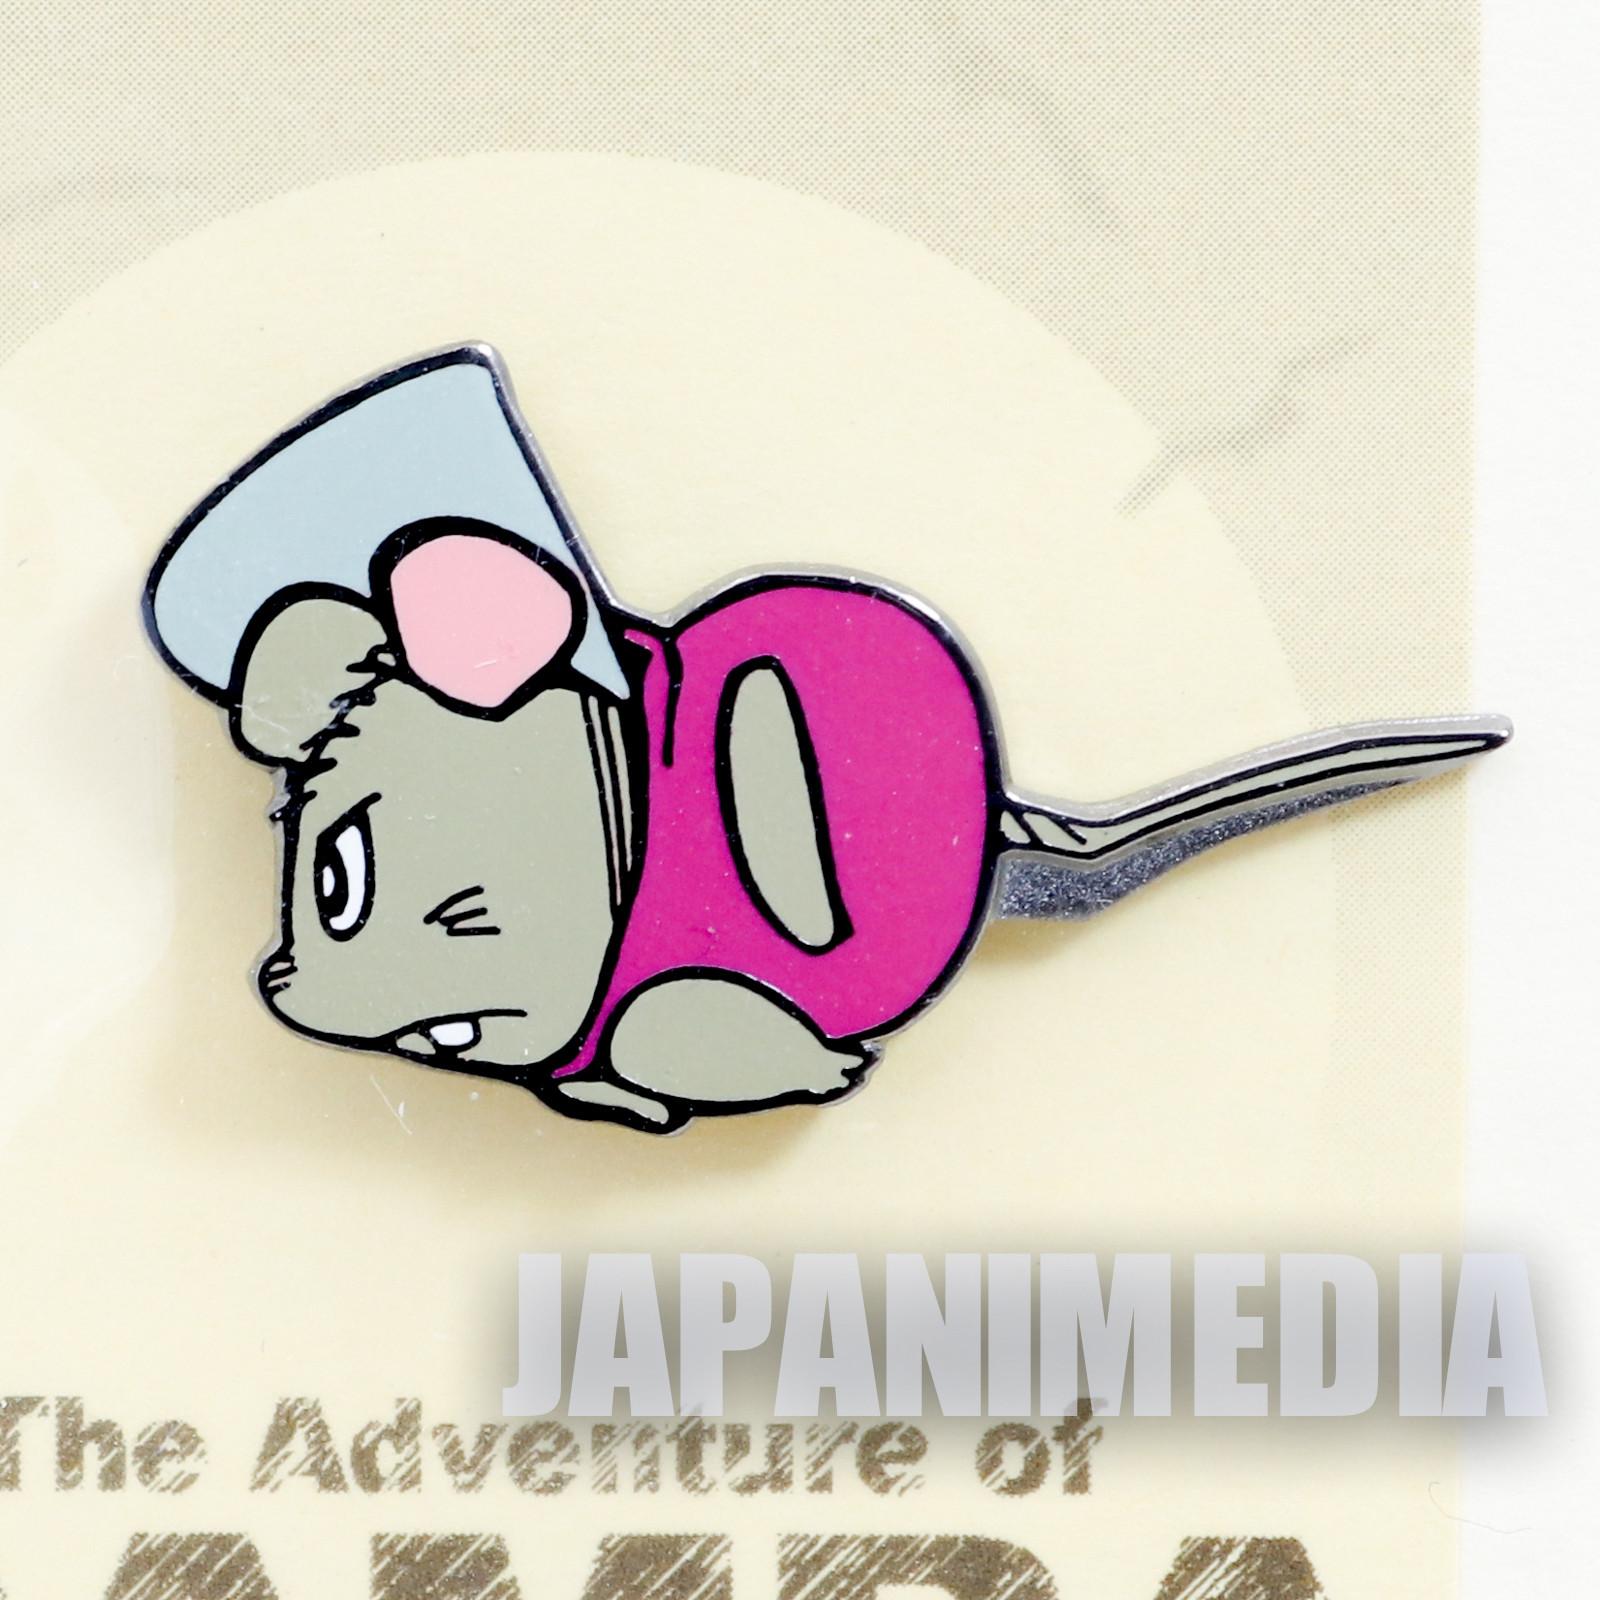 RARE! Gamba no Boken Chuta Metal Pins JAPAN ANIME MANGA